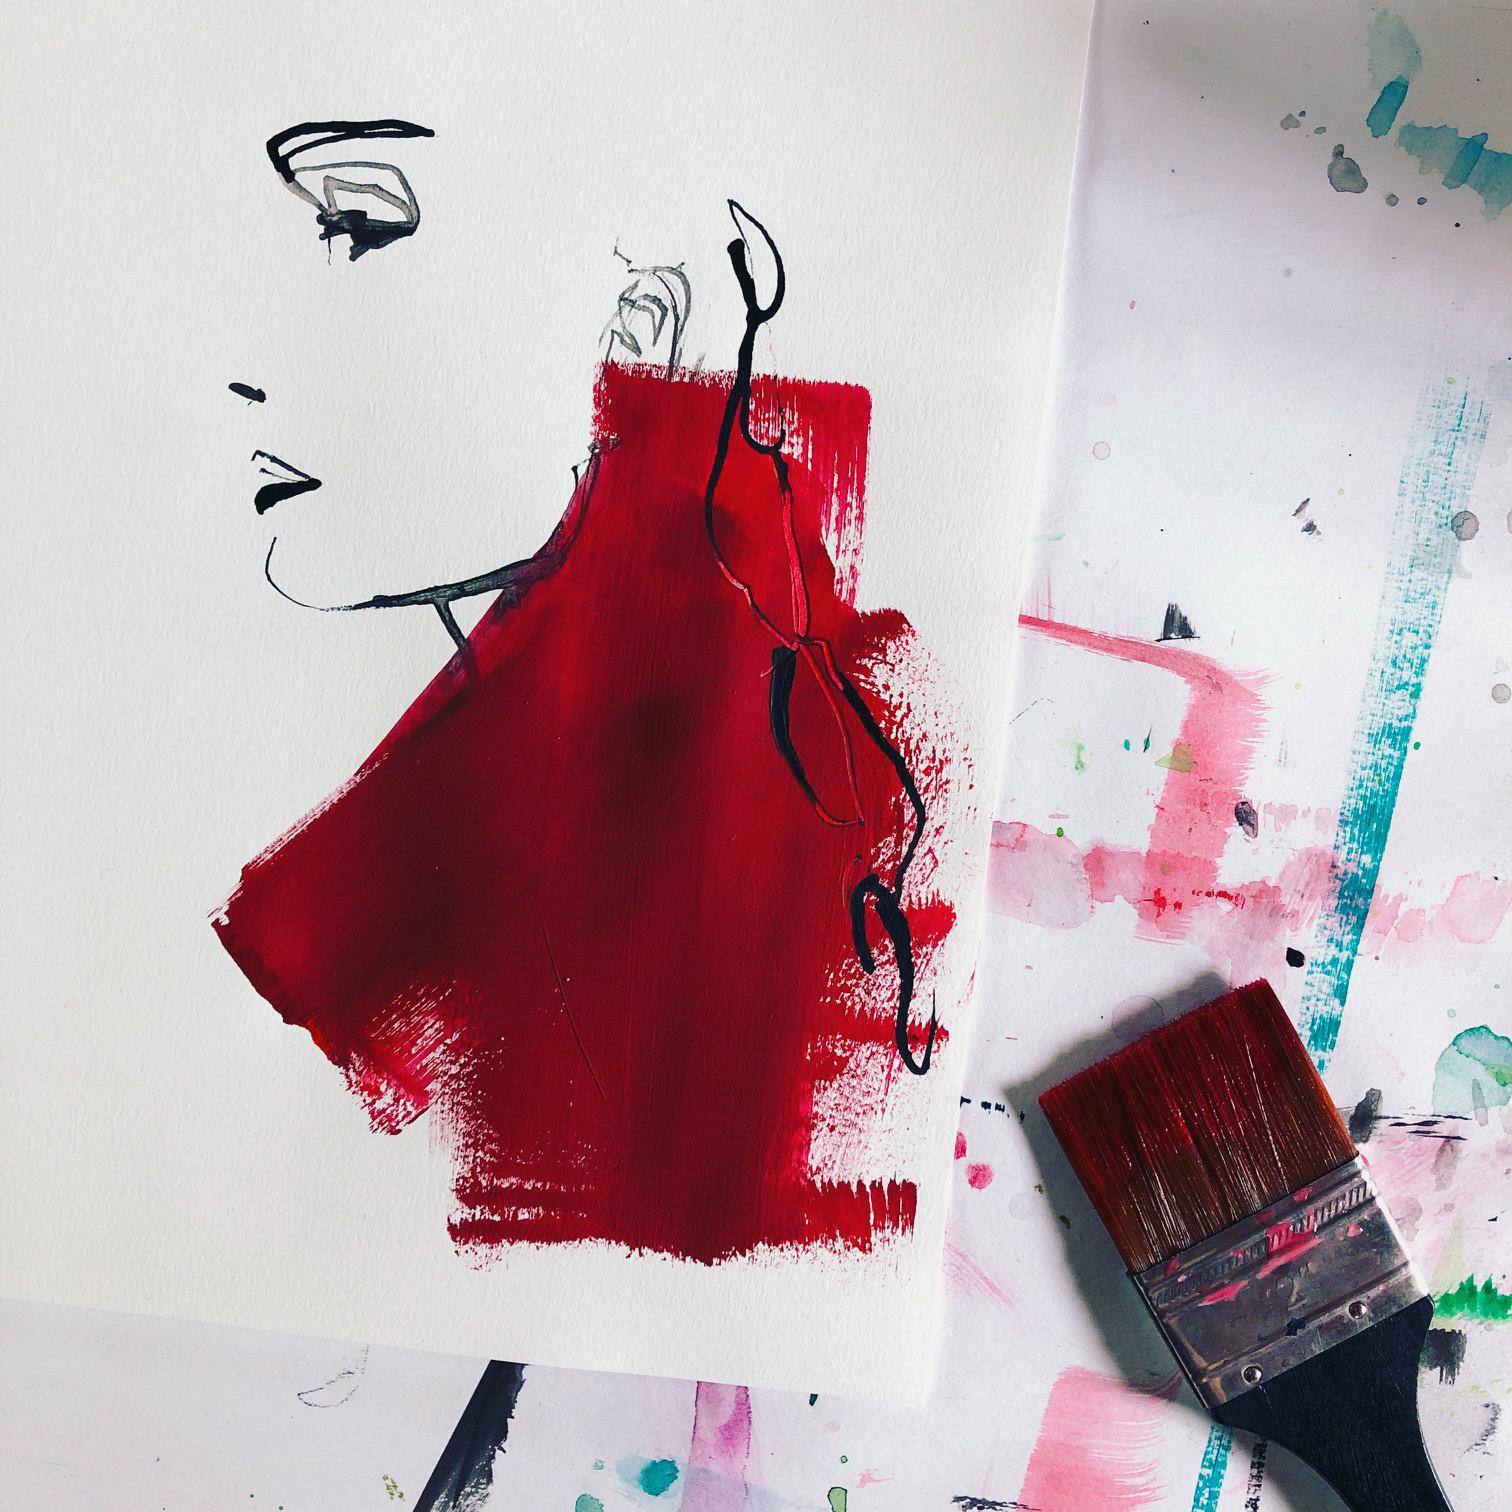 TessaIllustration_Aries.jpg